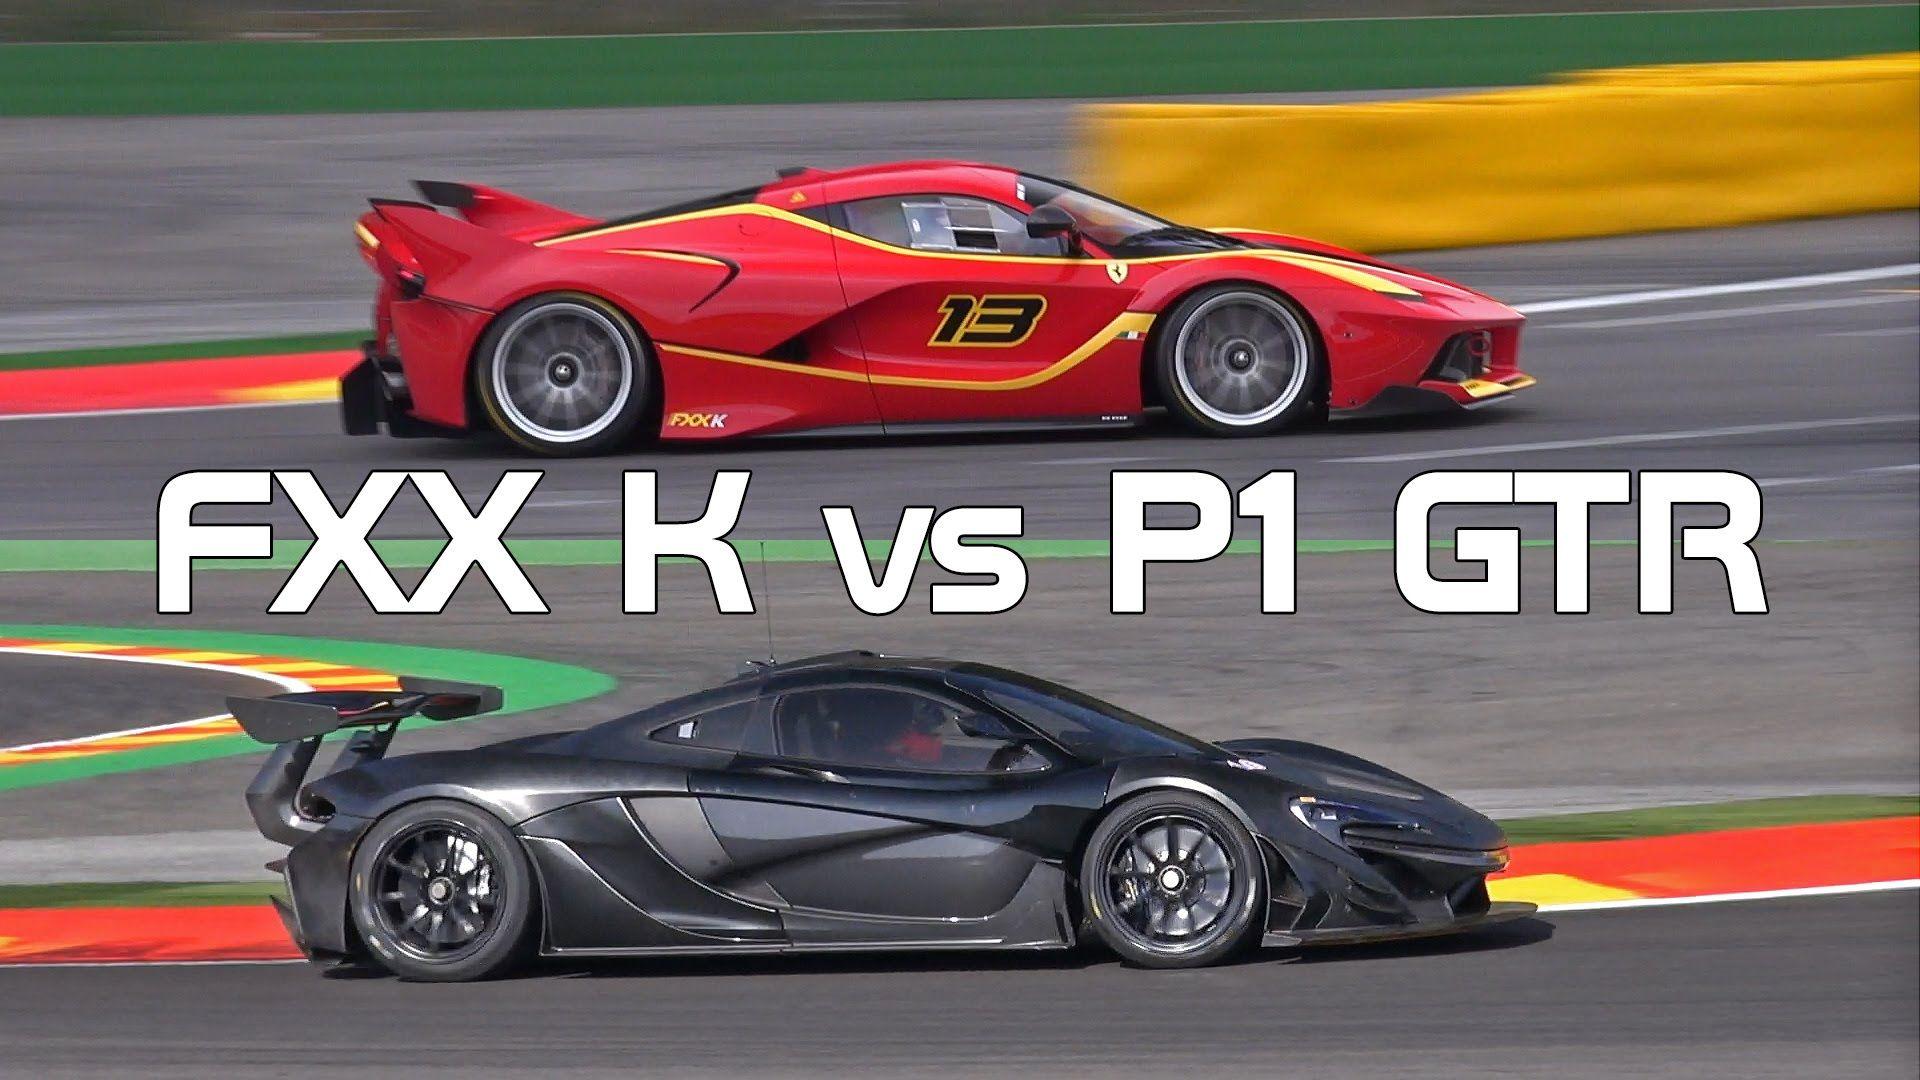 McLaren P GTR Vs Ferrari FXX K Sound Comparison Cars - Sports cars comparison